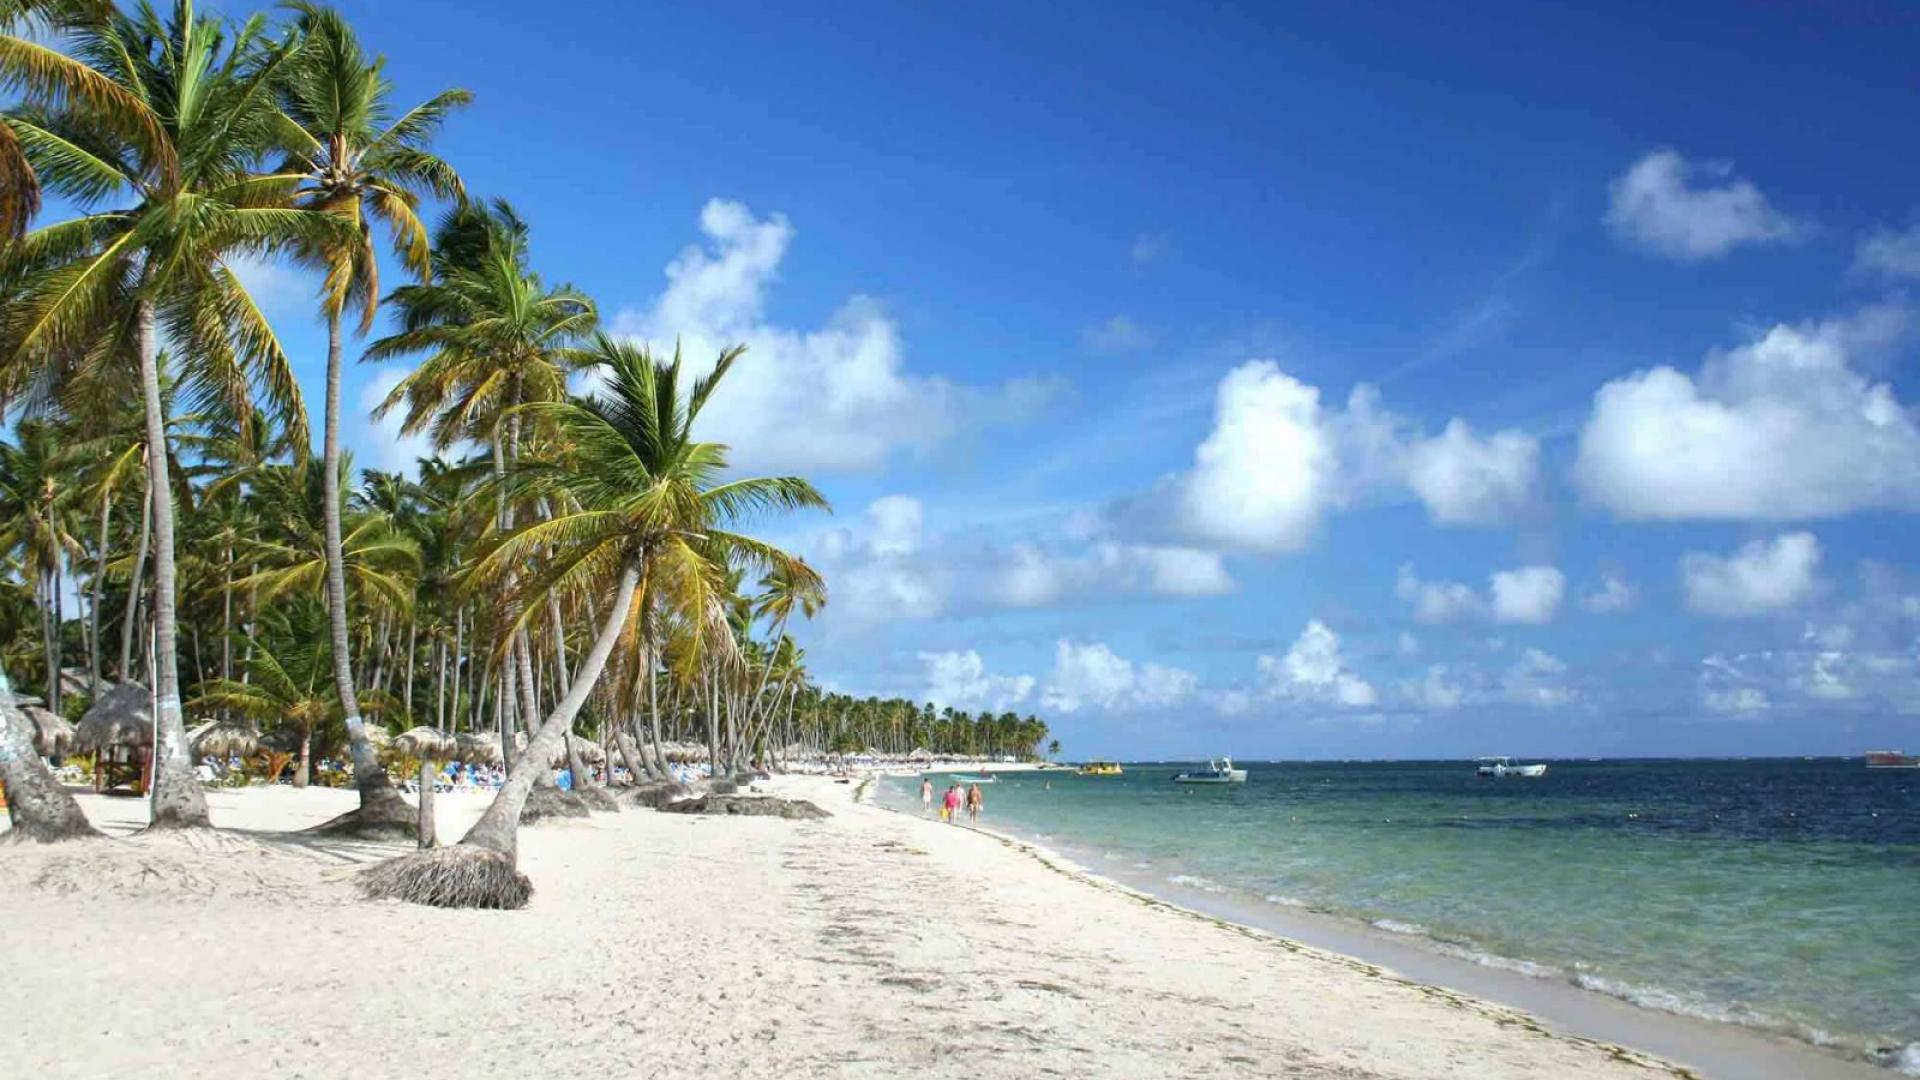 Jamaica Beach America S 237422 With Resolutions 19201080 Pixel 1920x1080